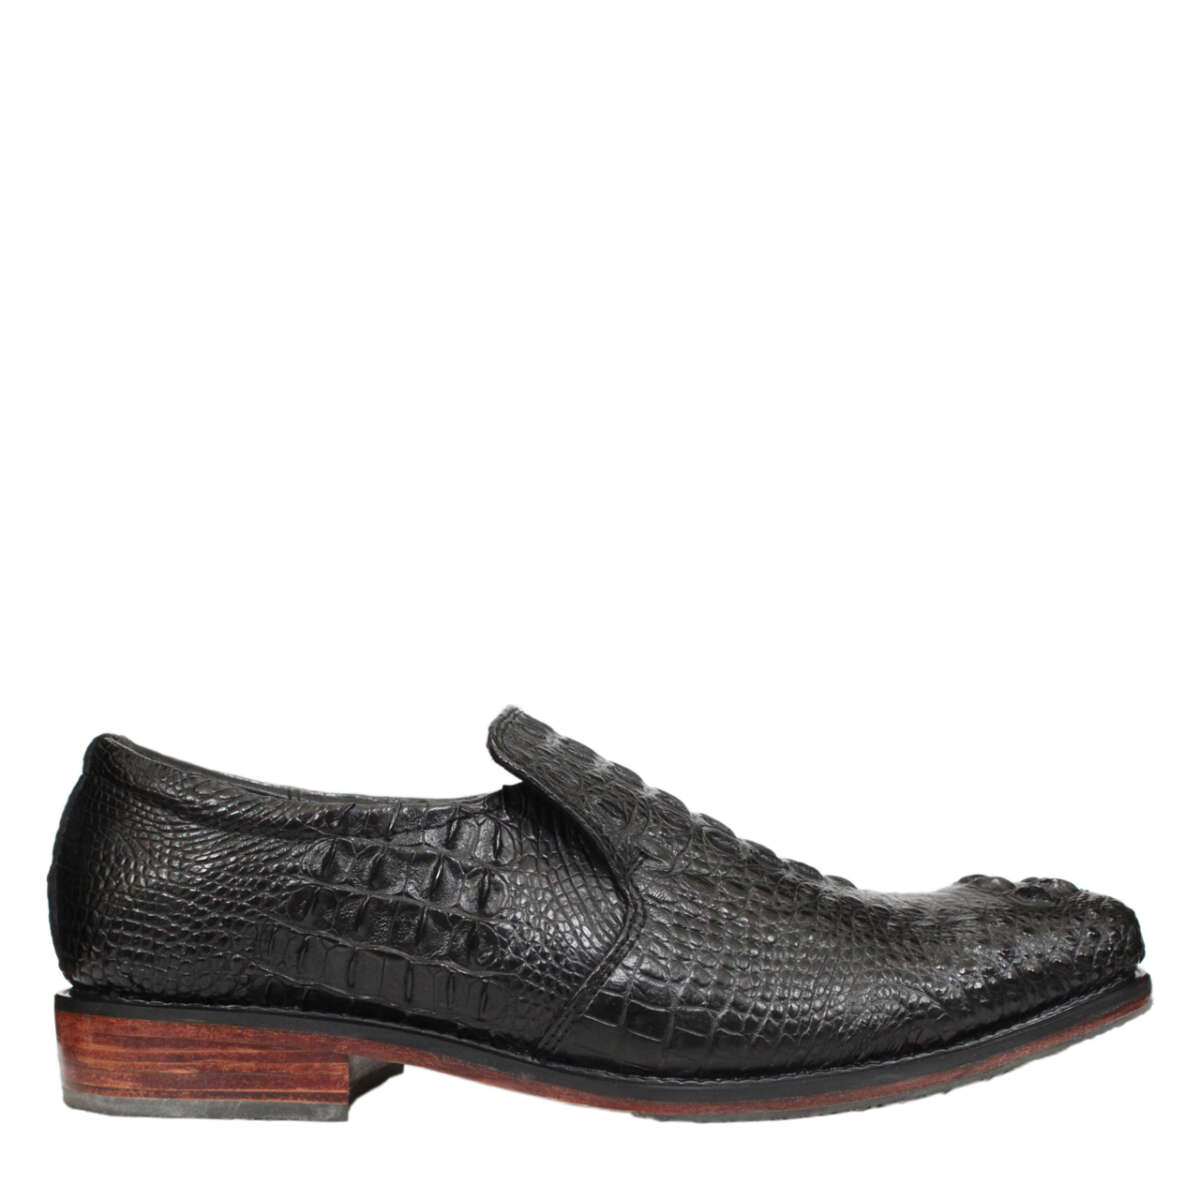 Giày nam da cá sấu S851a